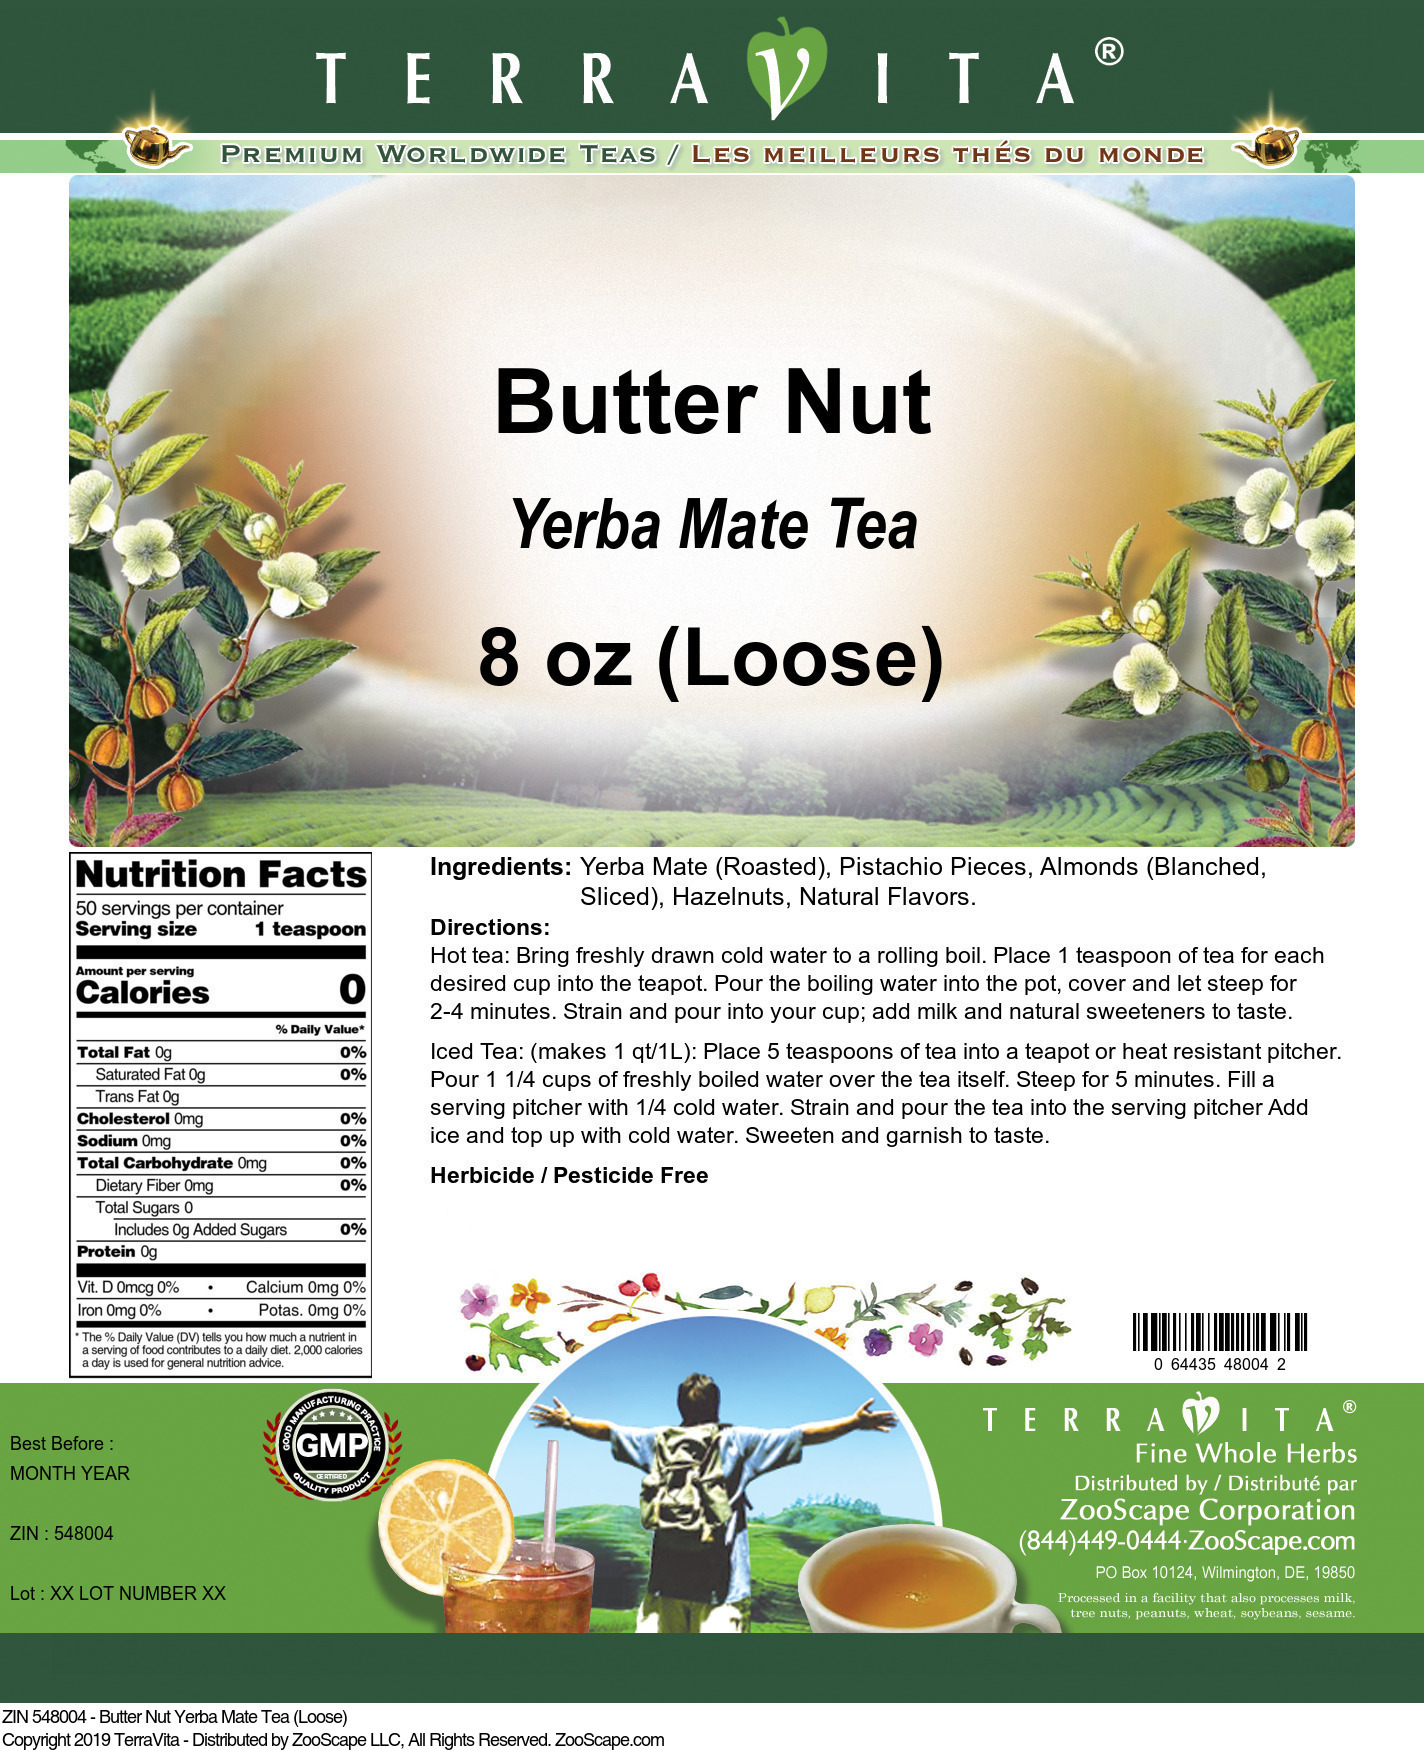 Butter Nut Yerba Mate